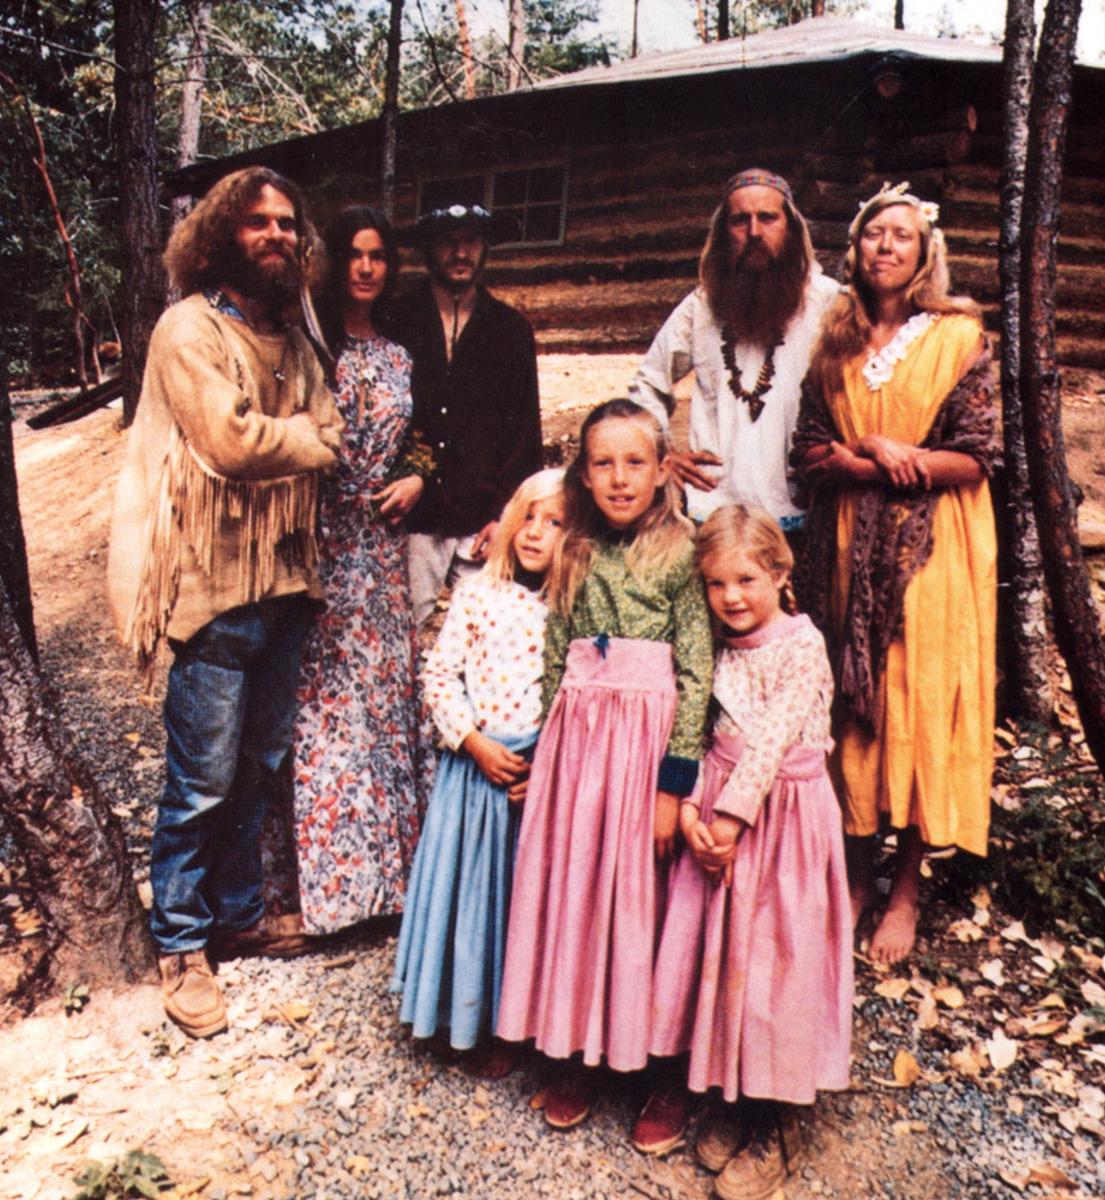 1969. Коммуна хиппи в Орегоне